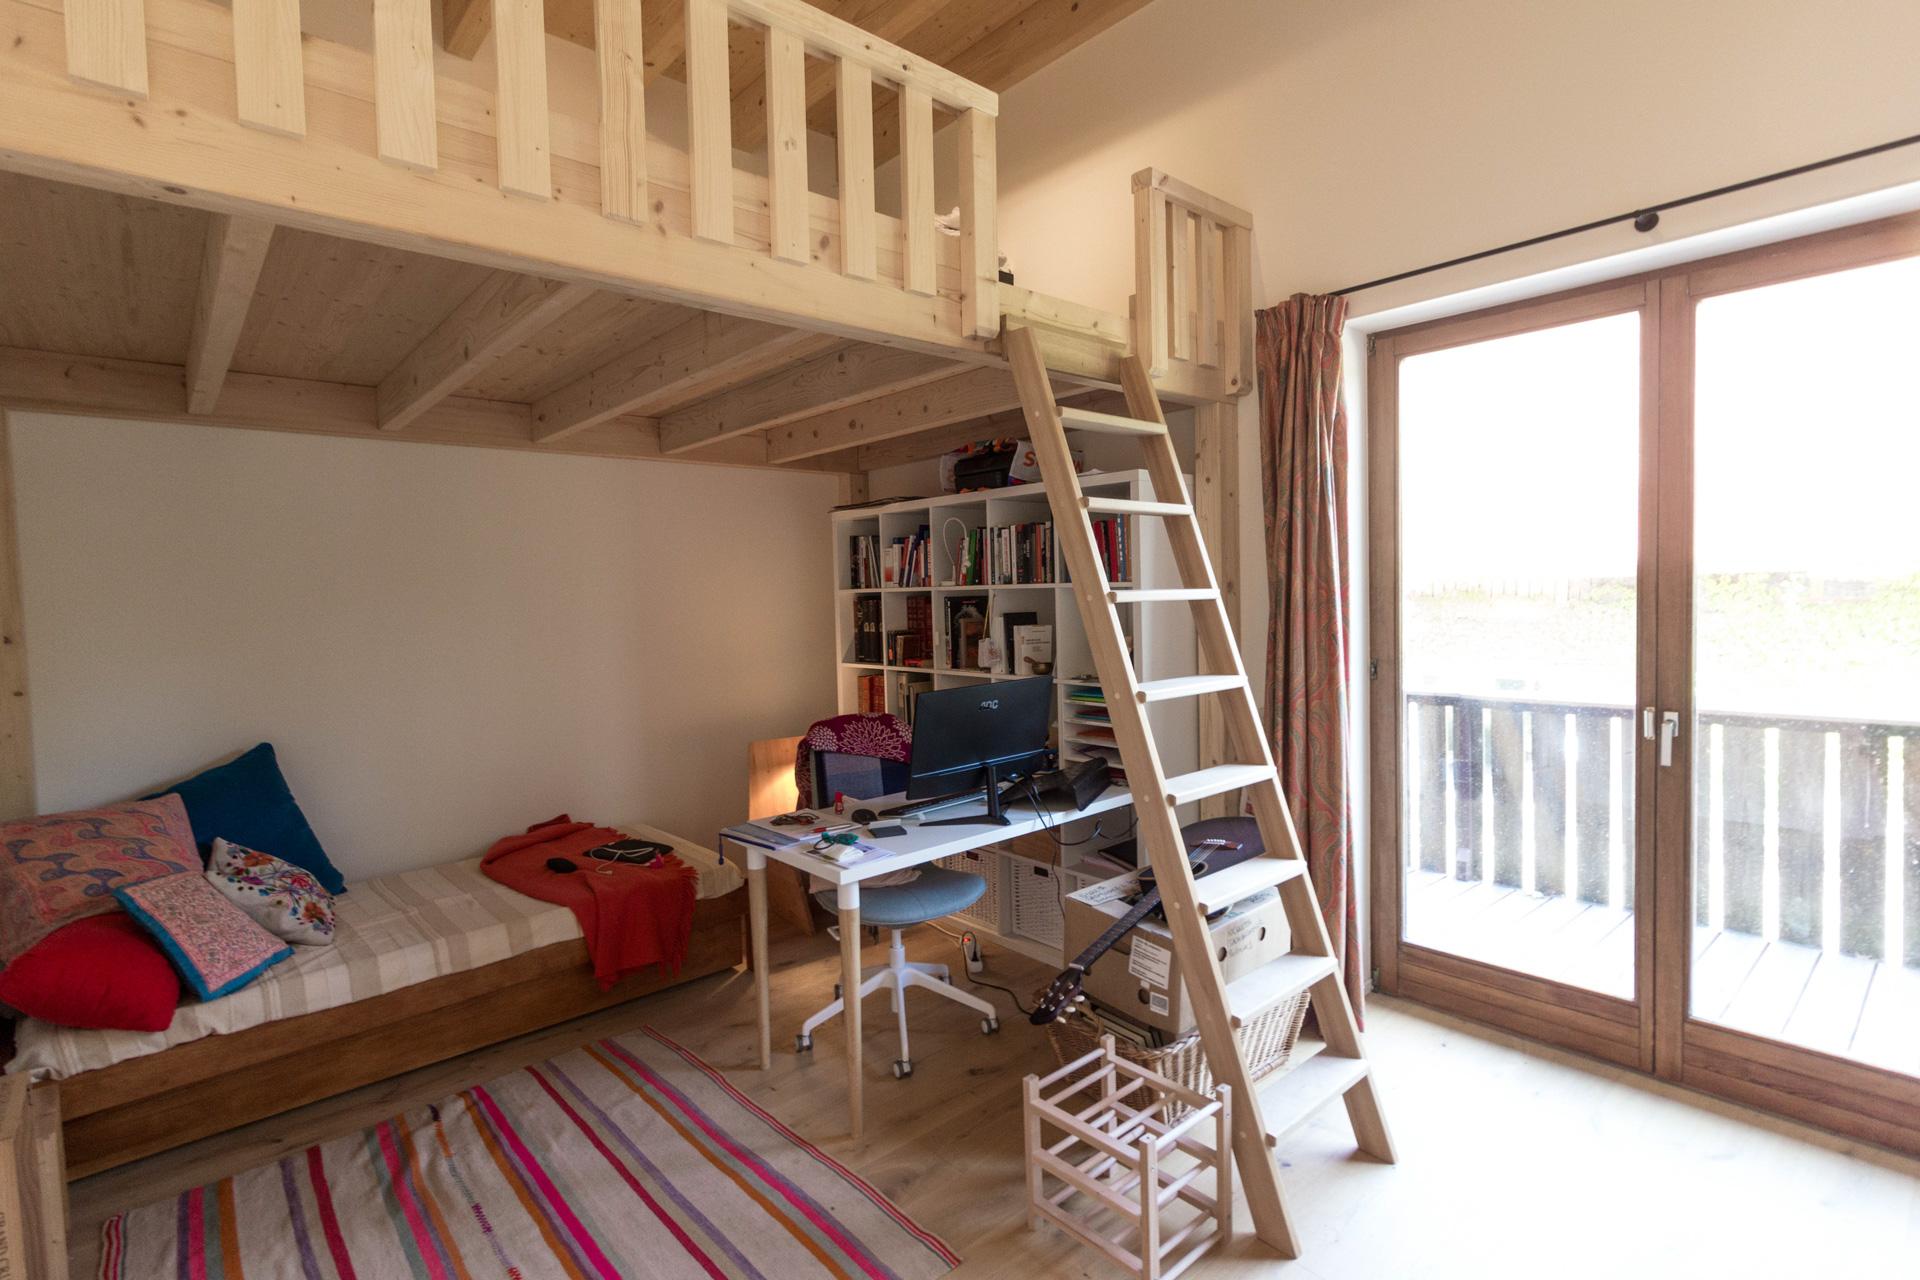 Apartment renovation : Bedroom